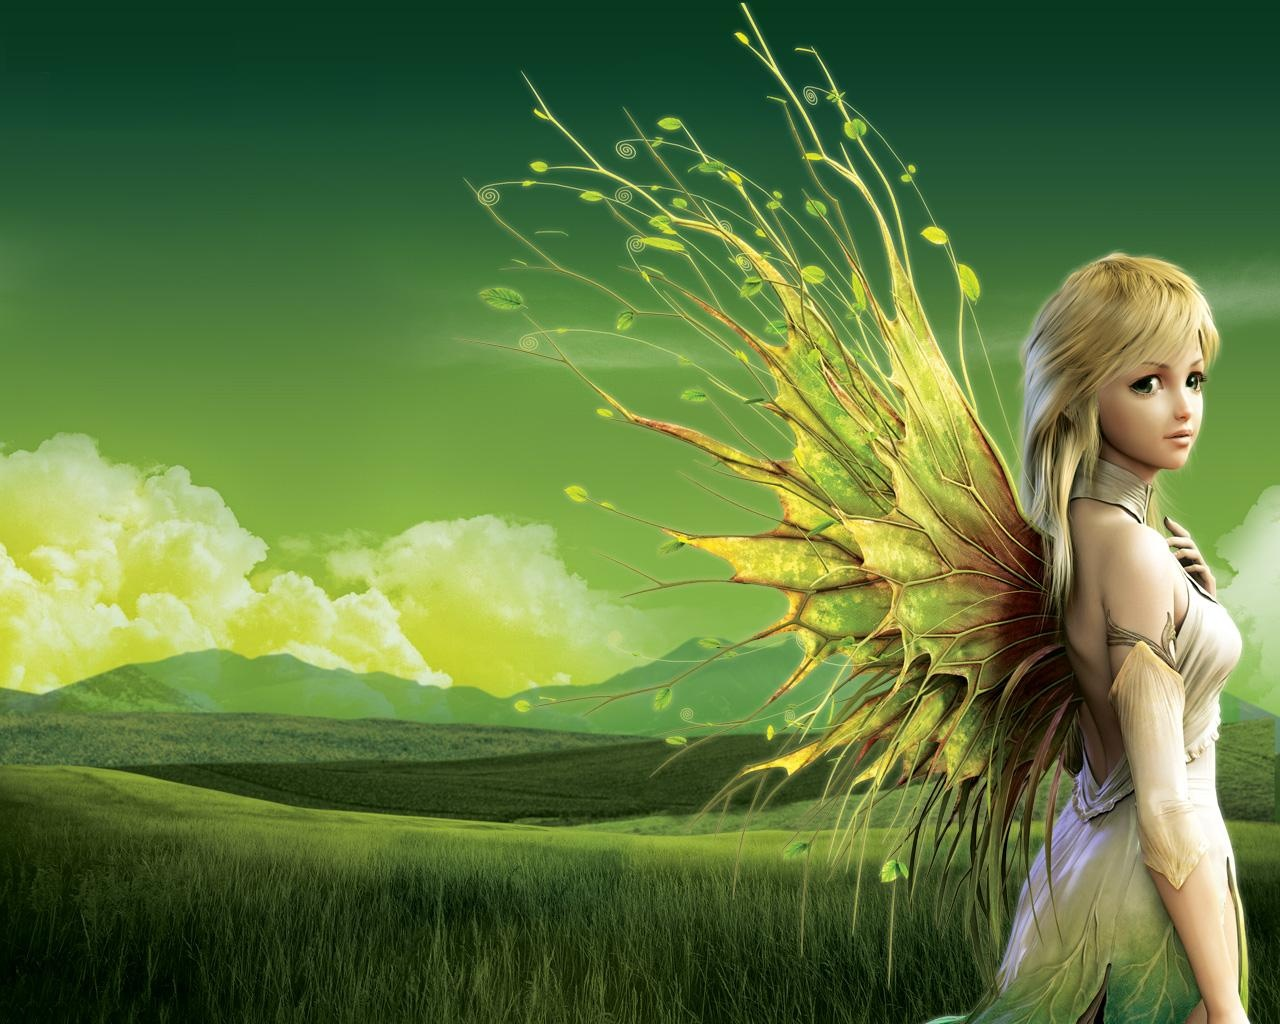 Free Download Fairy Wallpaper 7833 1280x1024px 1280x1024